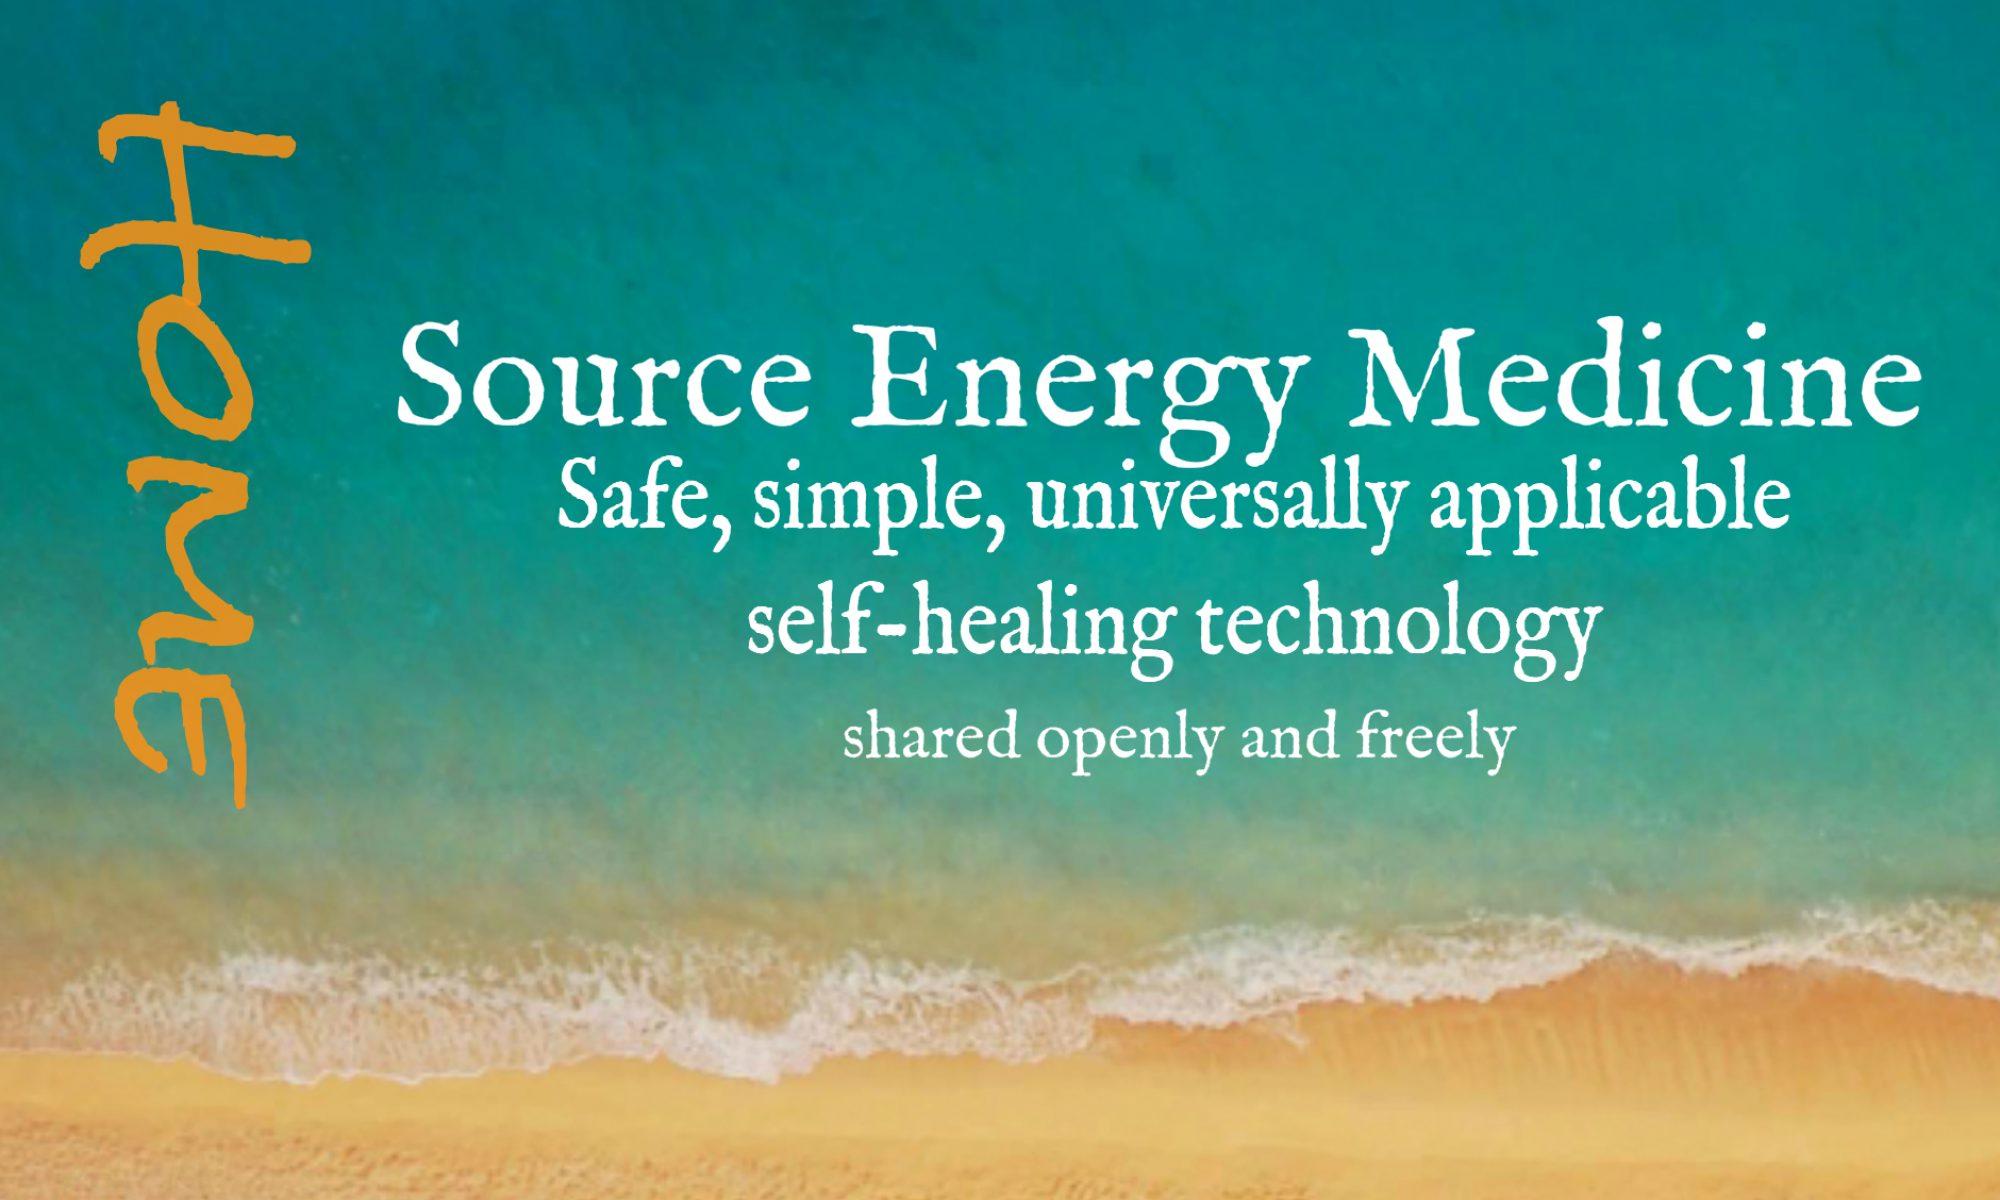 Source Energy Medicine